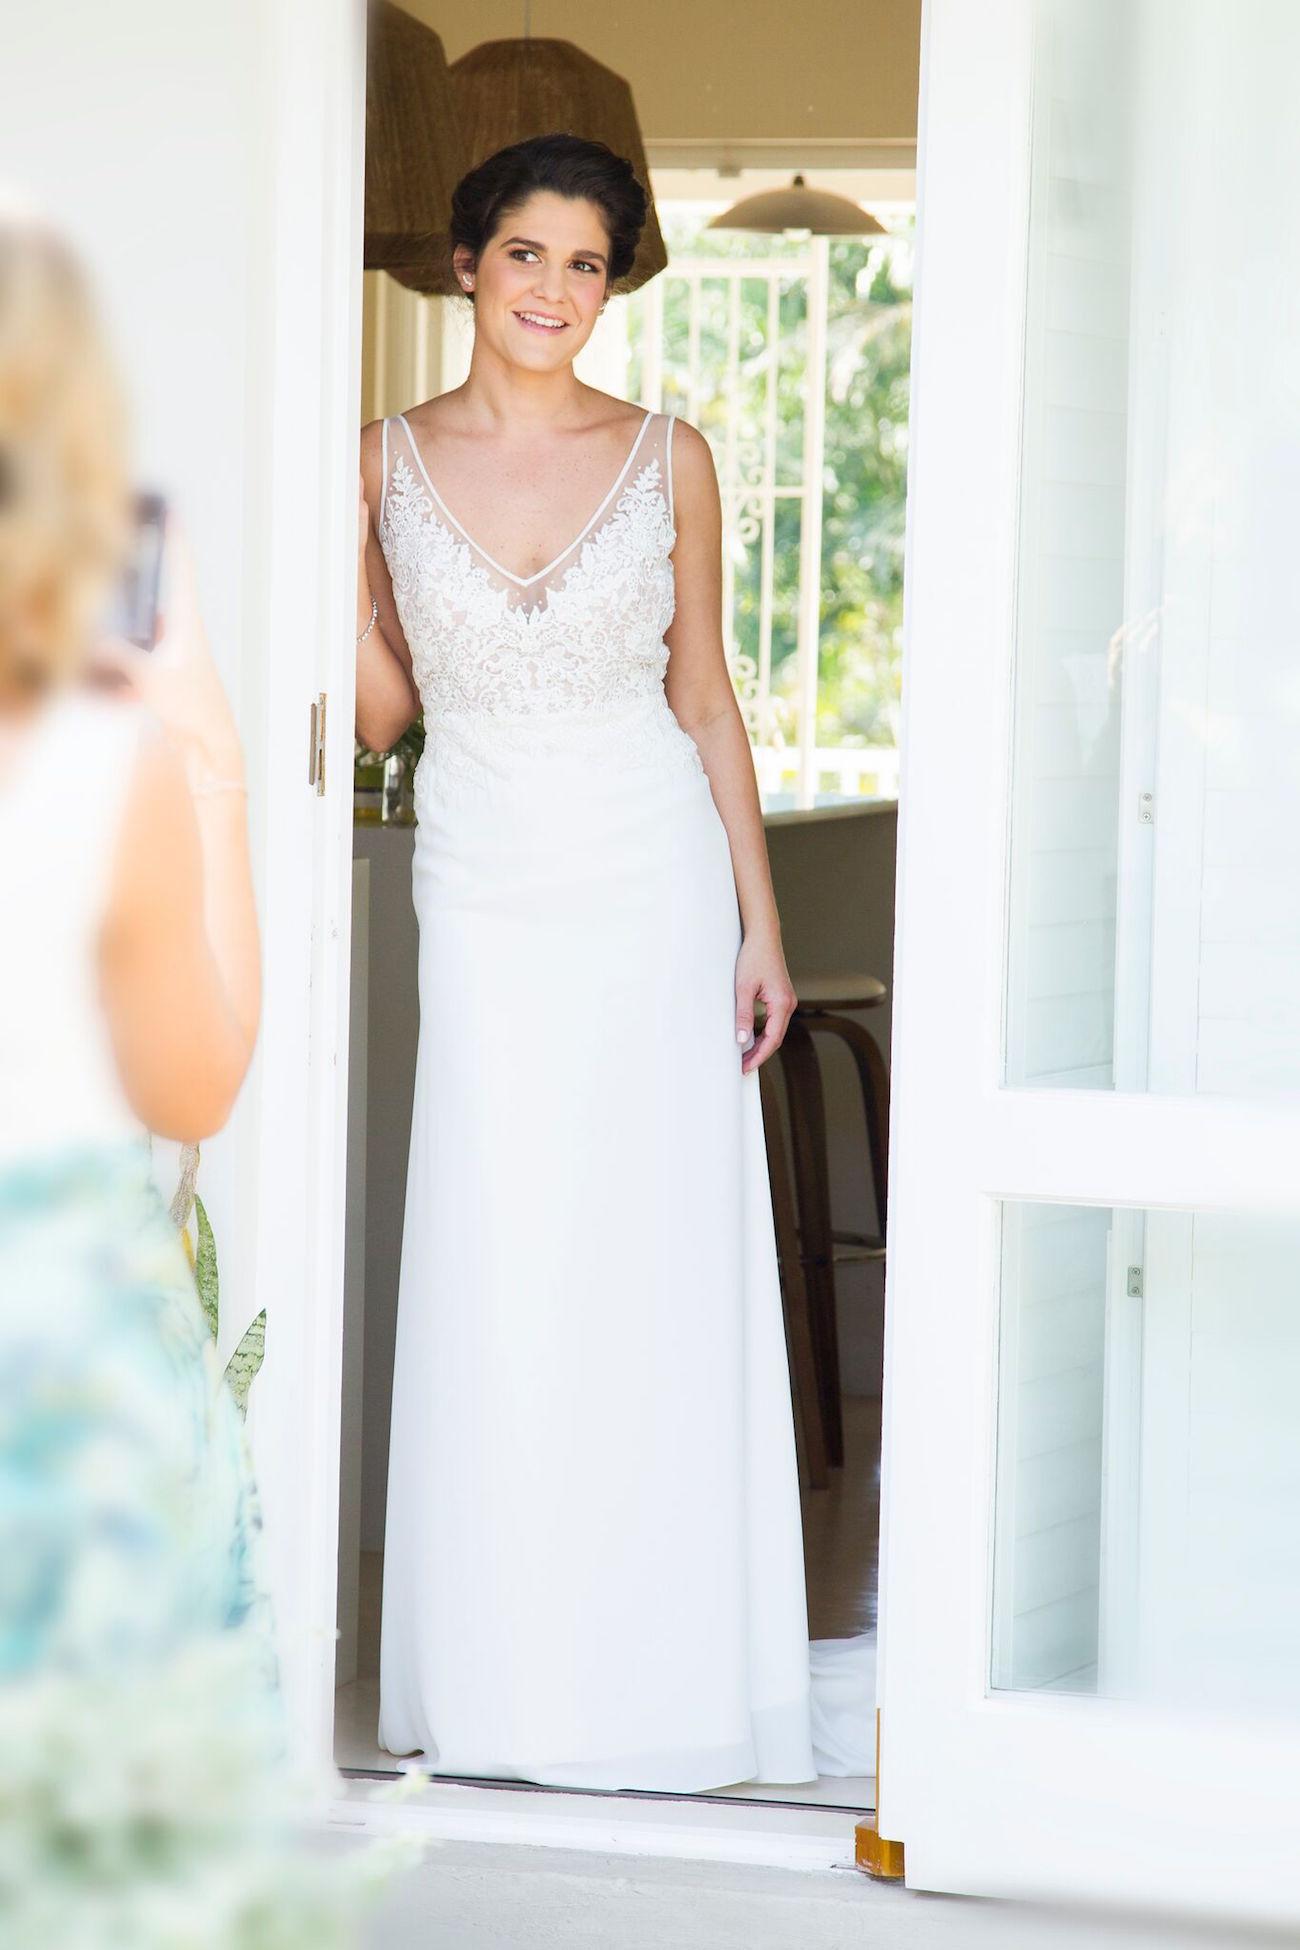 Julia Ferrandi Wedding Dress | Credit: Oh Happy Day & Dane Peterson